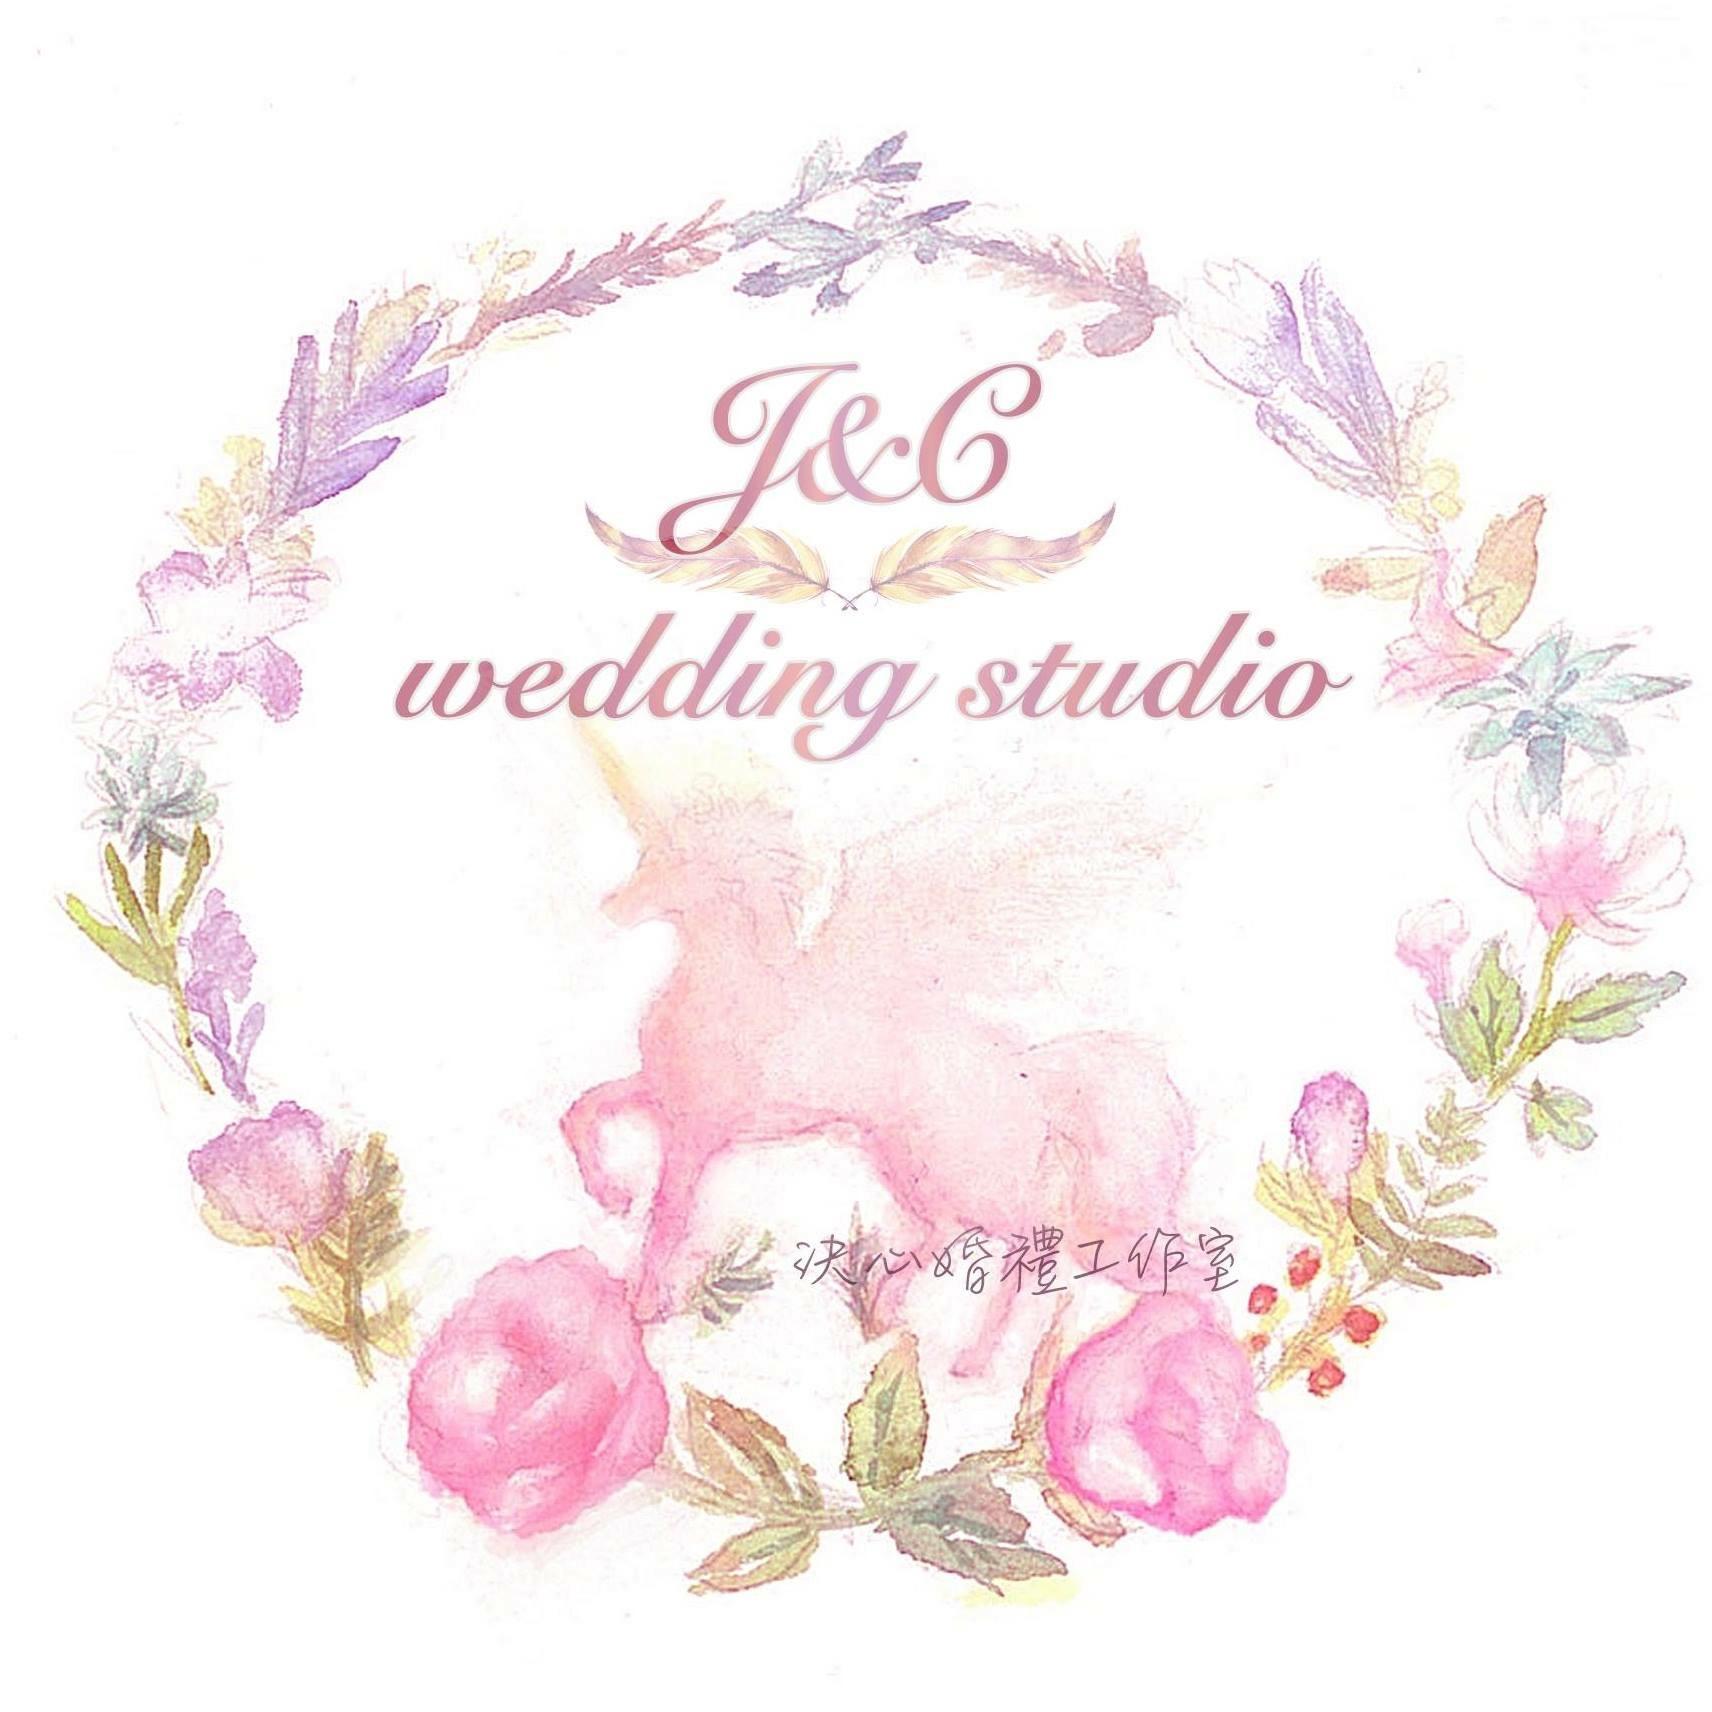 J&C Wedding Studio